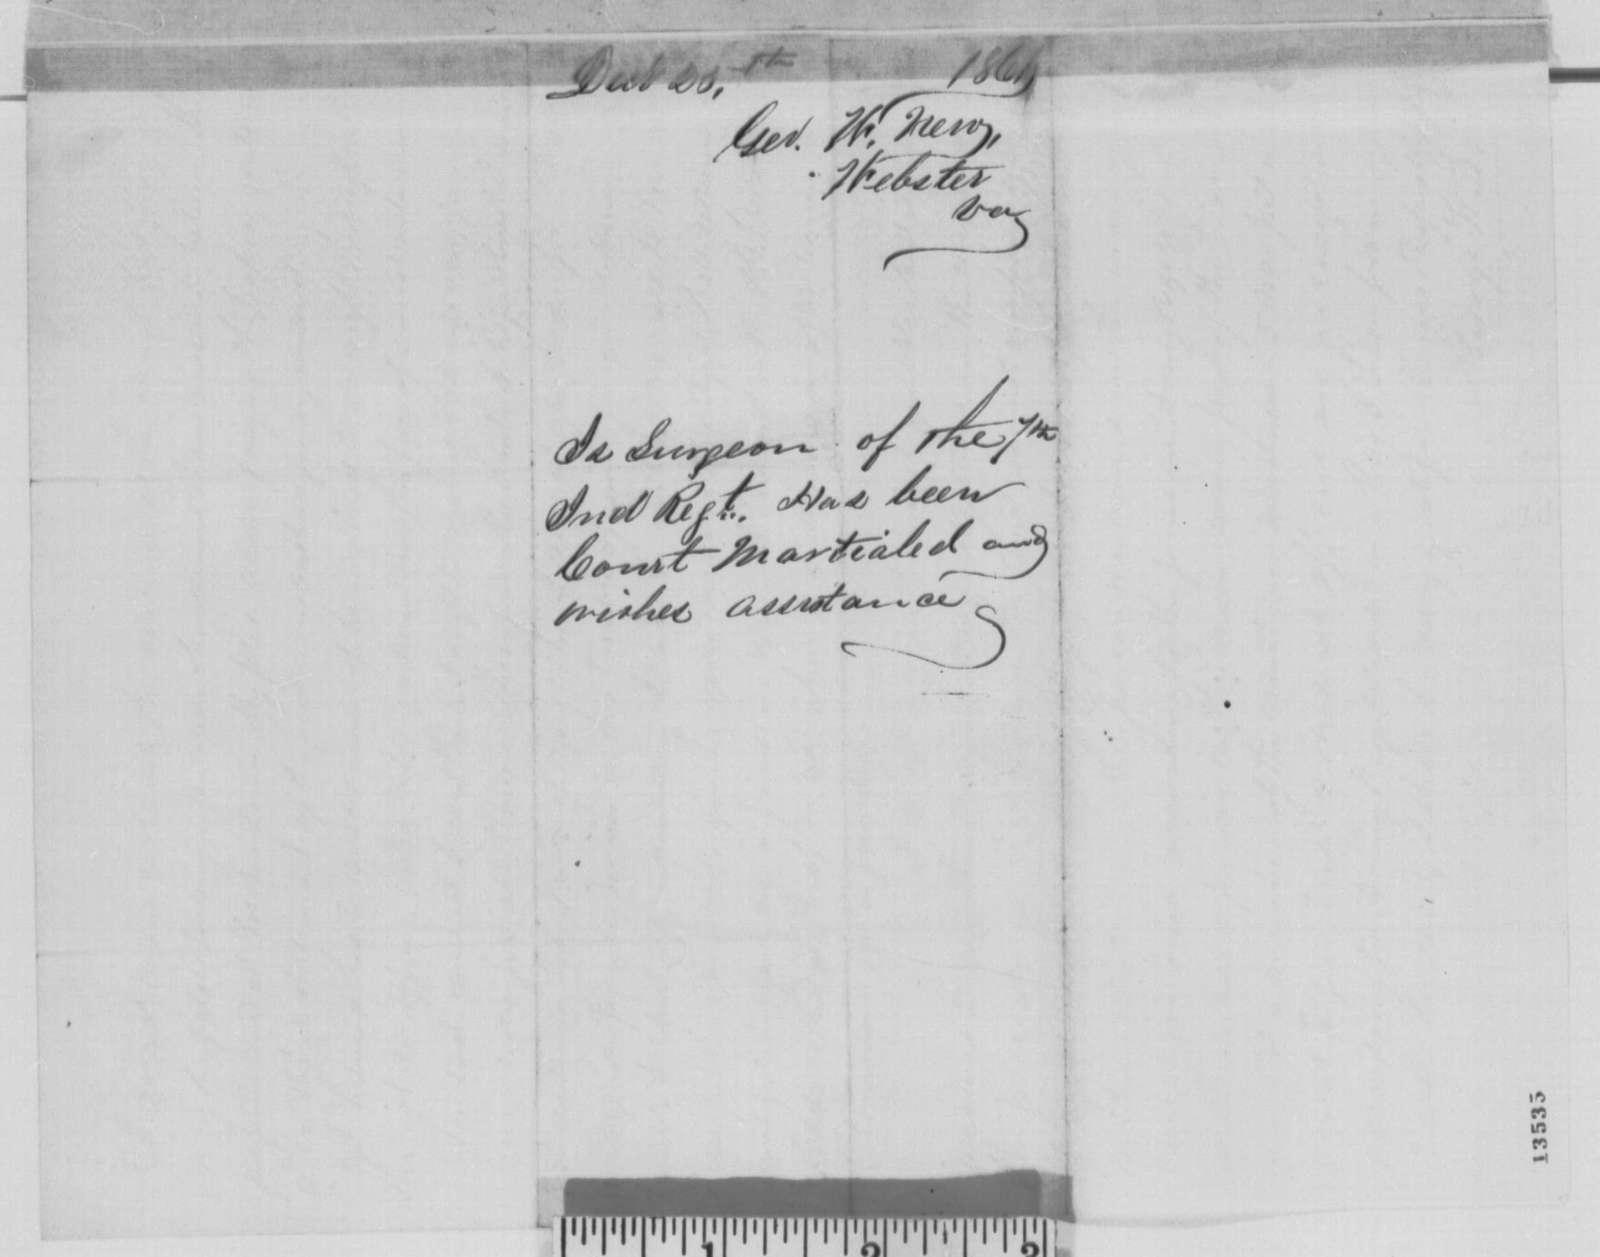 George W. New to Caleb B. Smith, Monday, December 23, 1861  (Seeks reinstatement as a regimental surgeon)